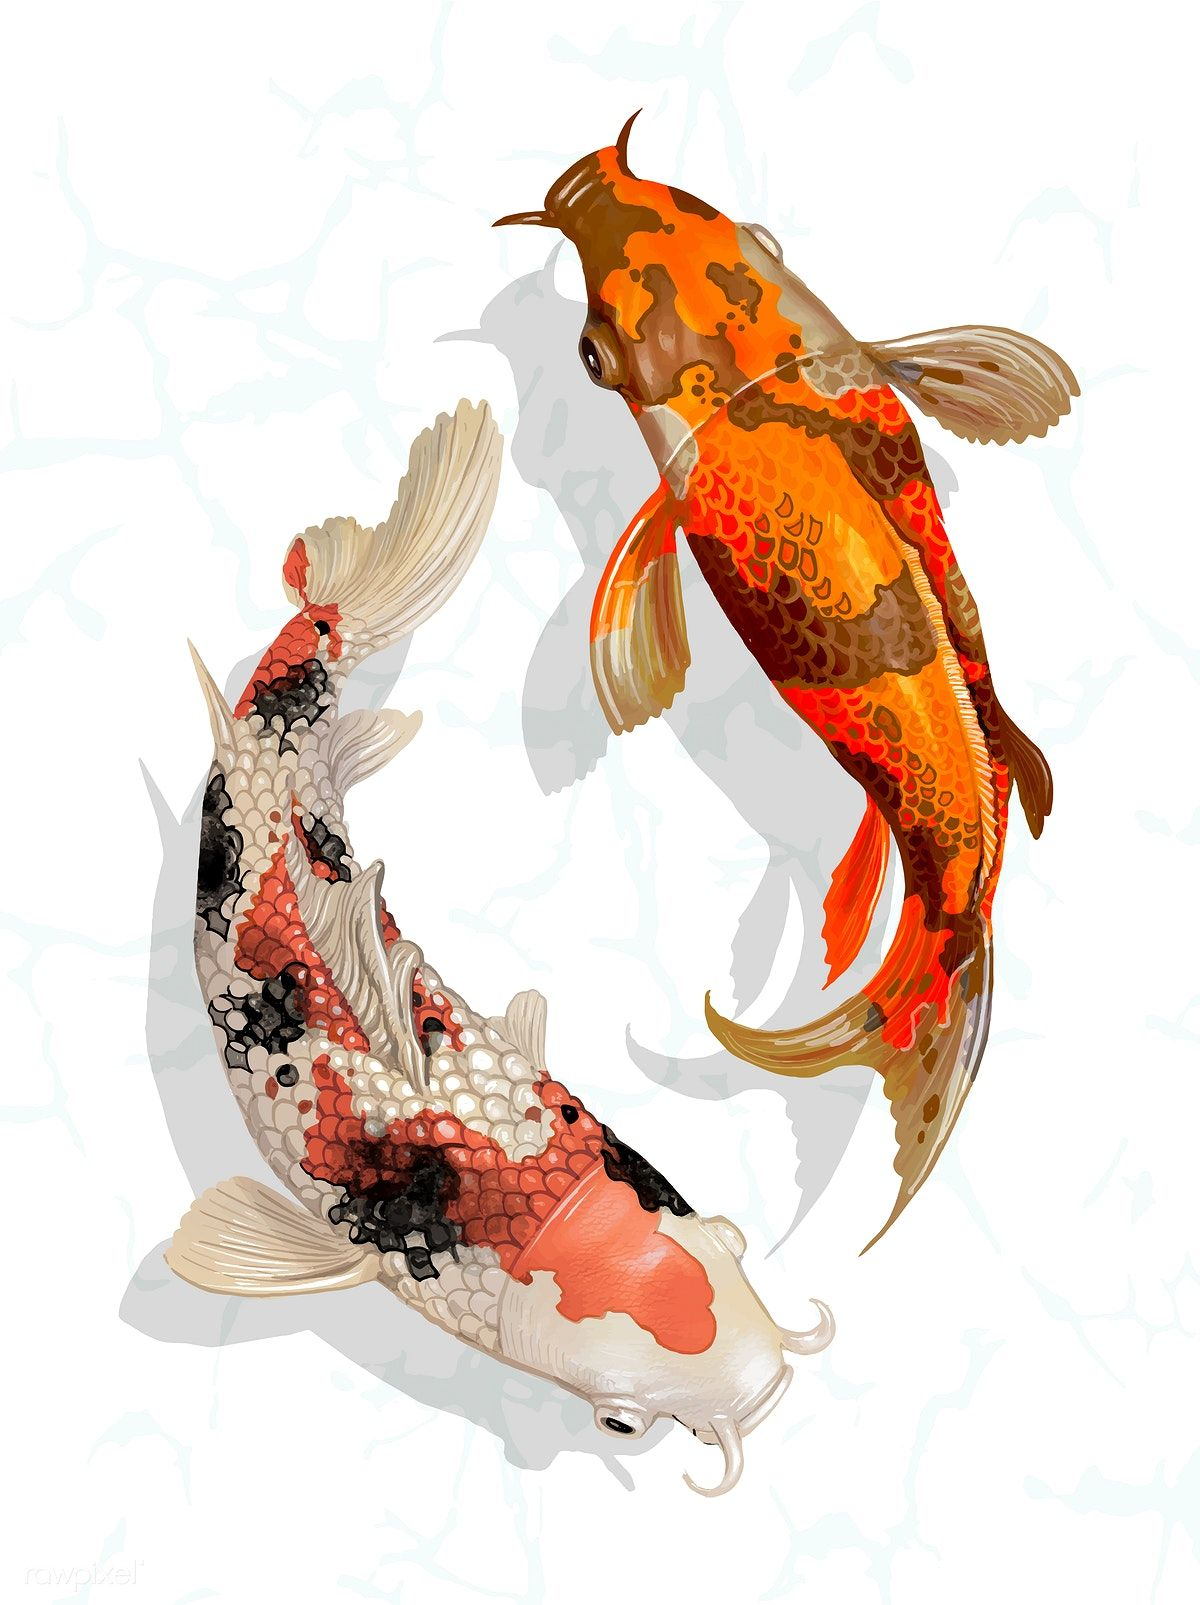 Download Premium Vector Of Two Japanese Koi Fish Swimming 449929 Koi Fish Koi Art Japanese Koi